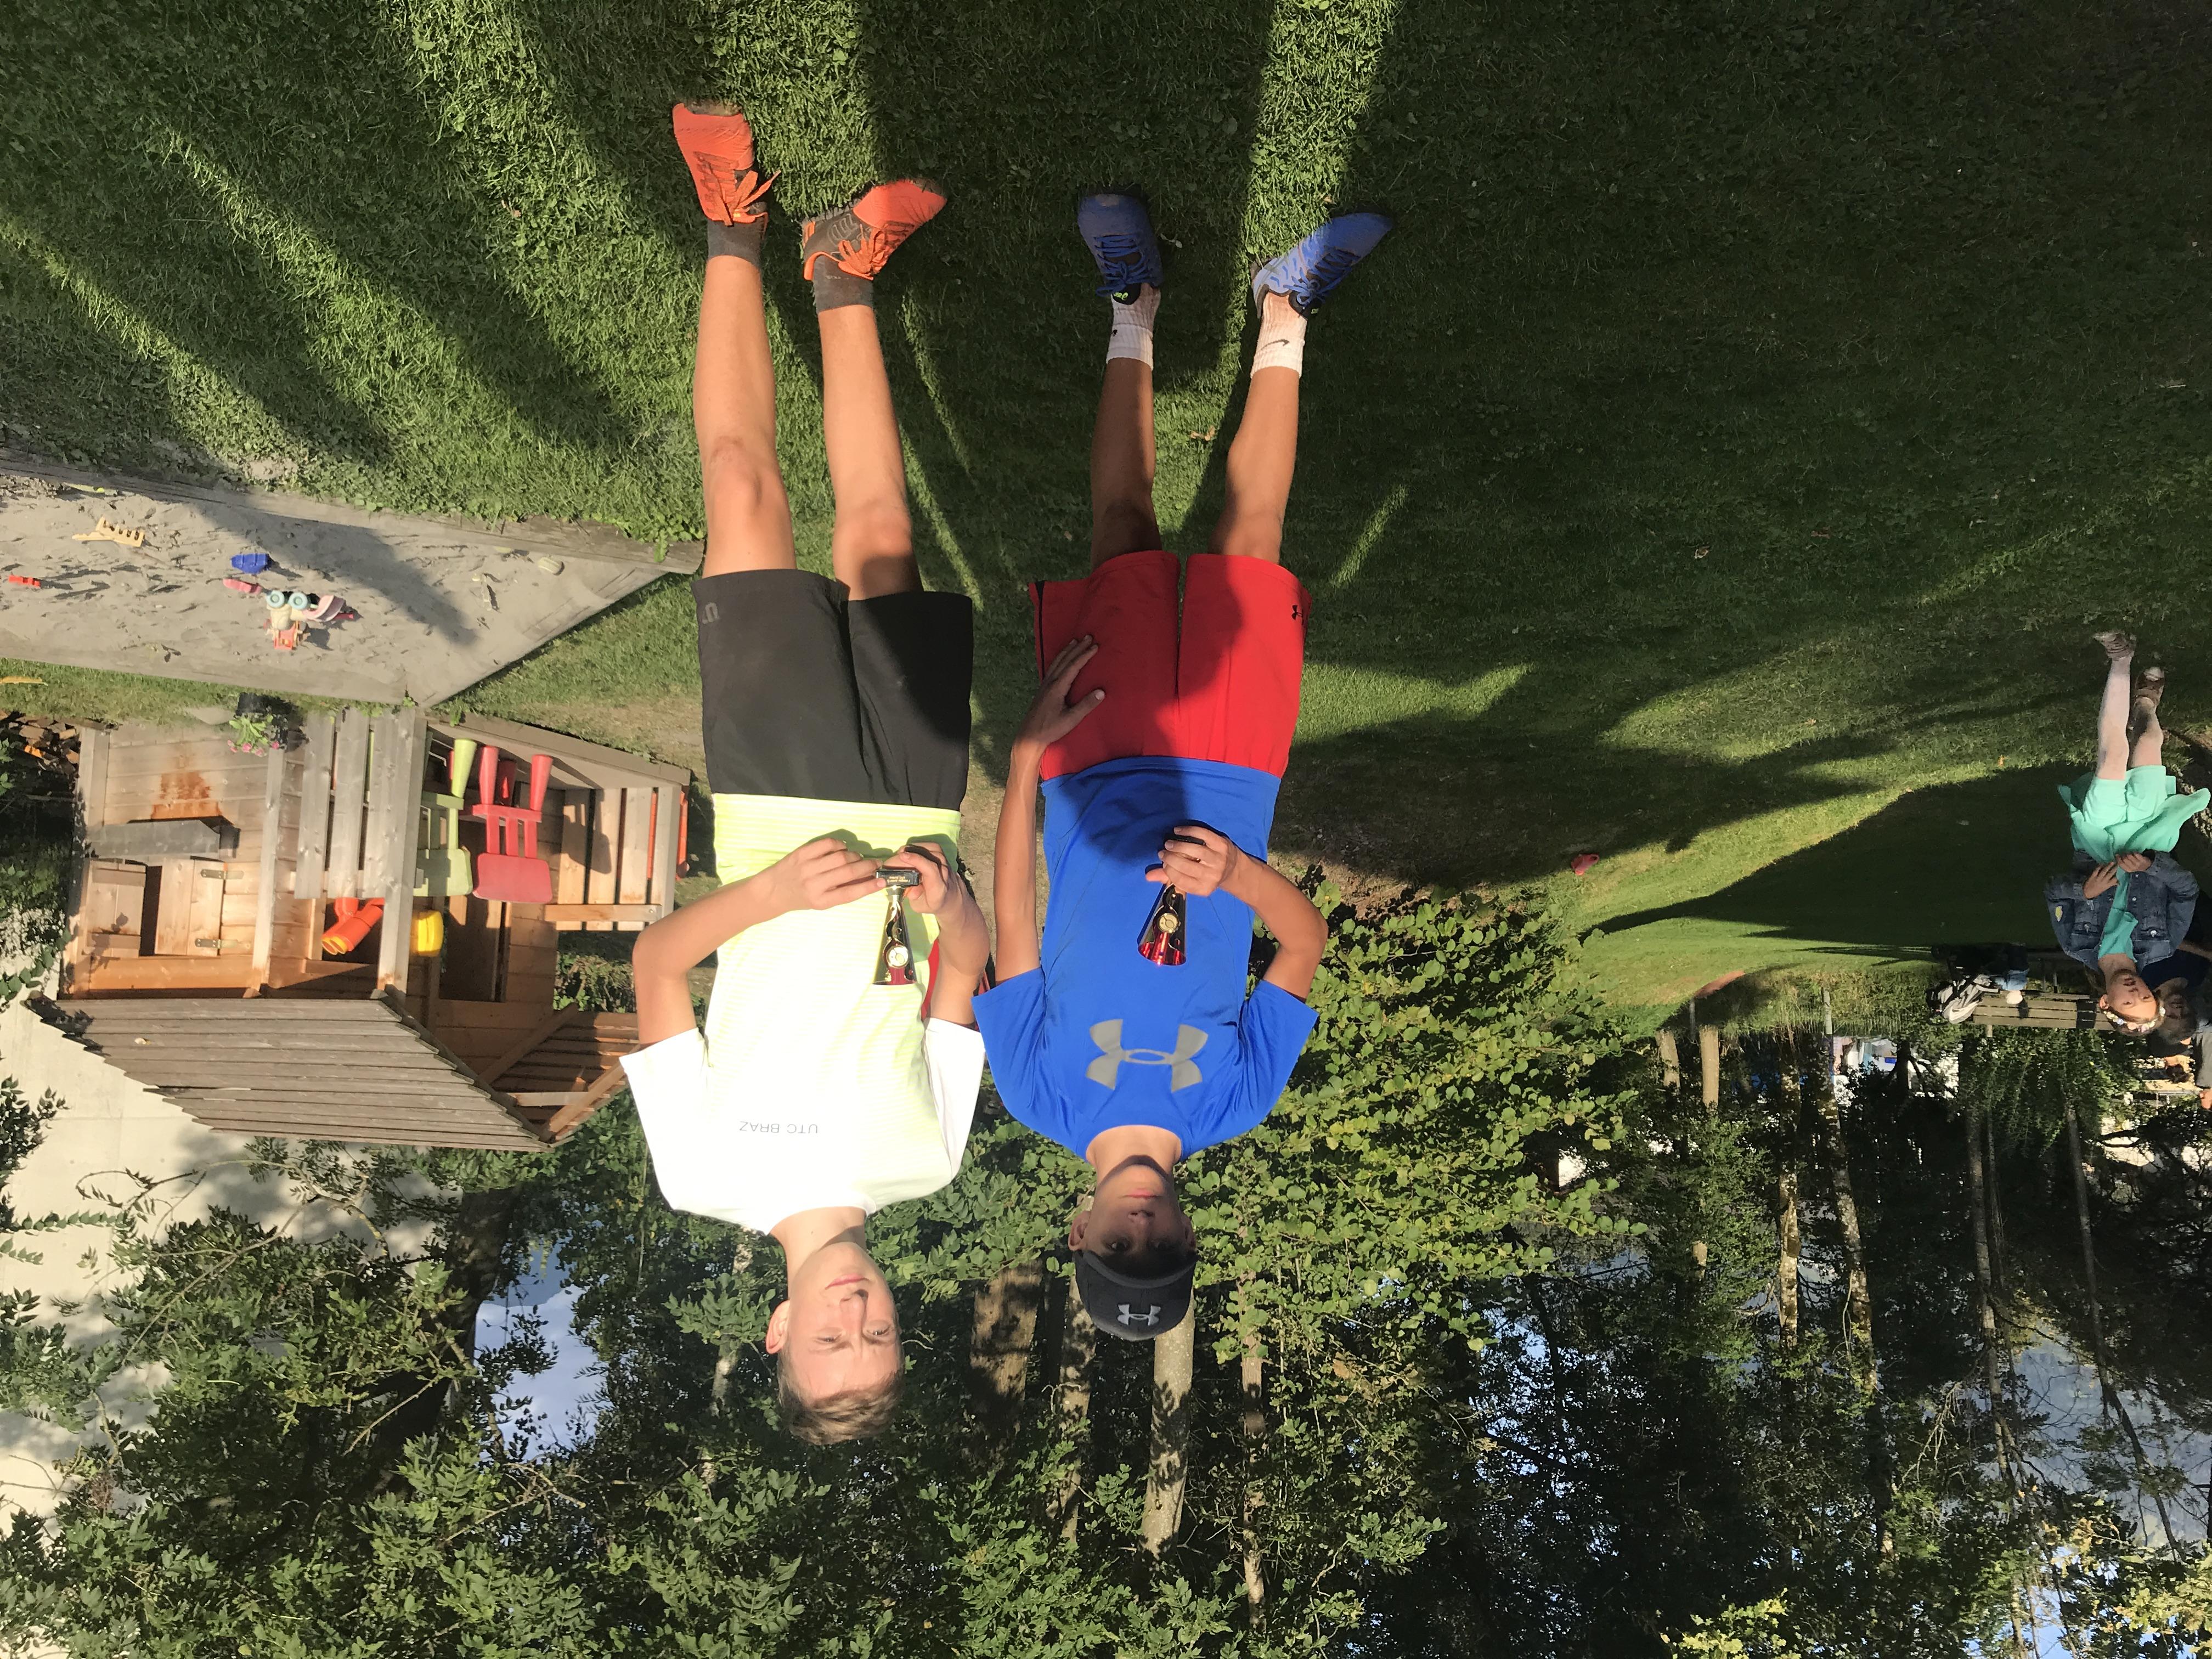 Walgau Junior Cup 2019